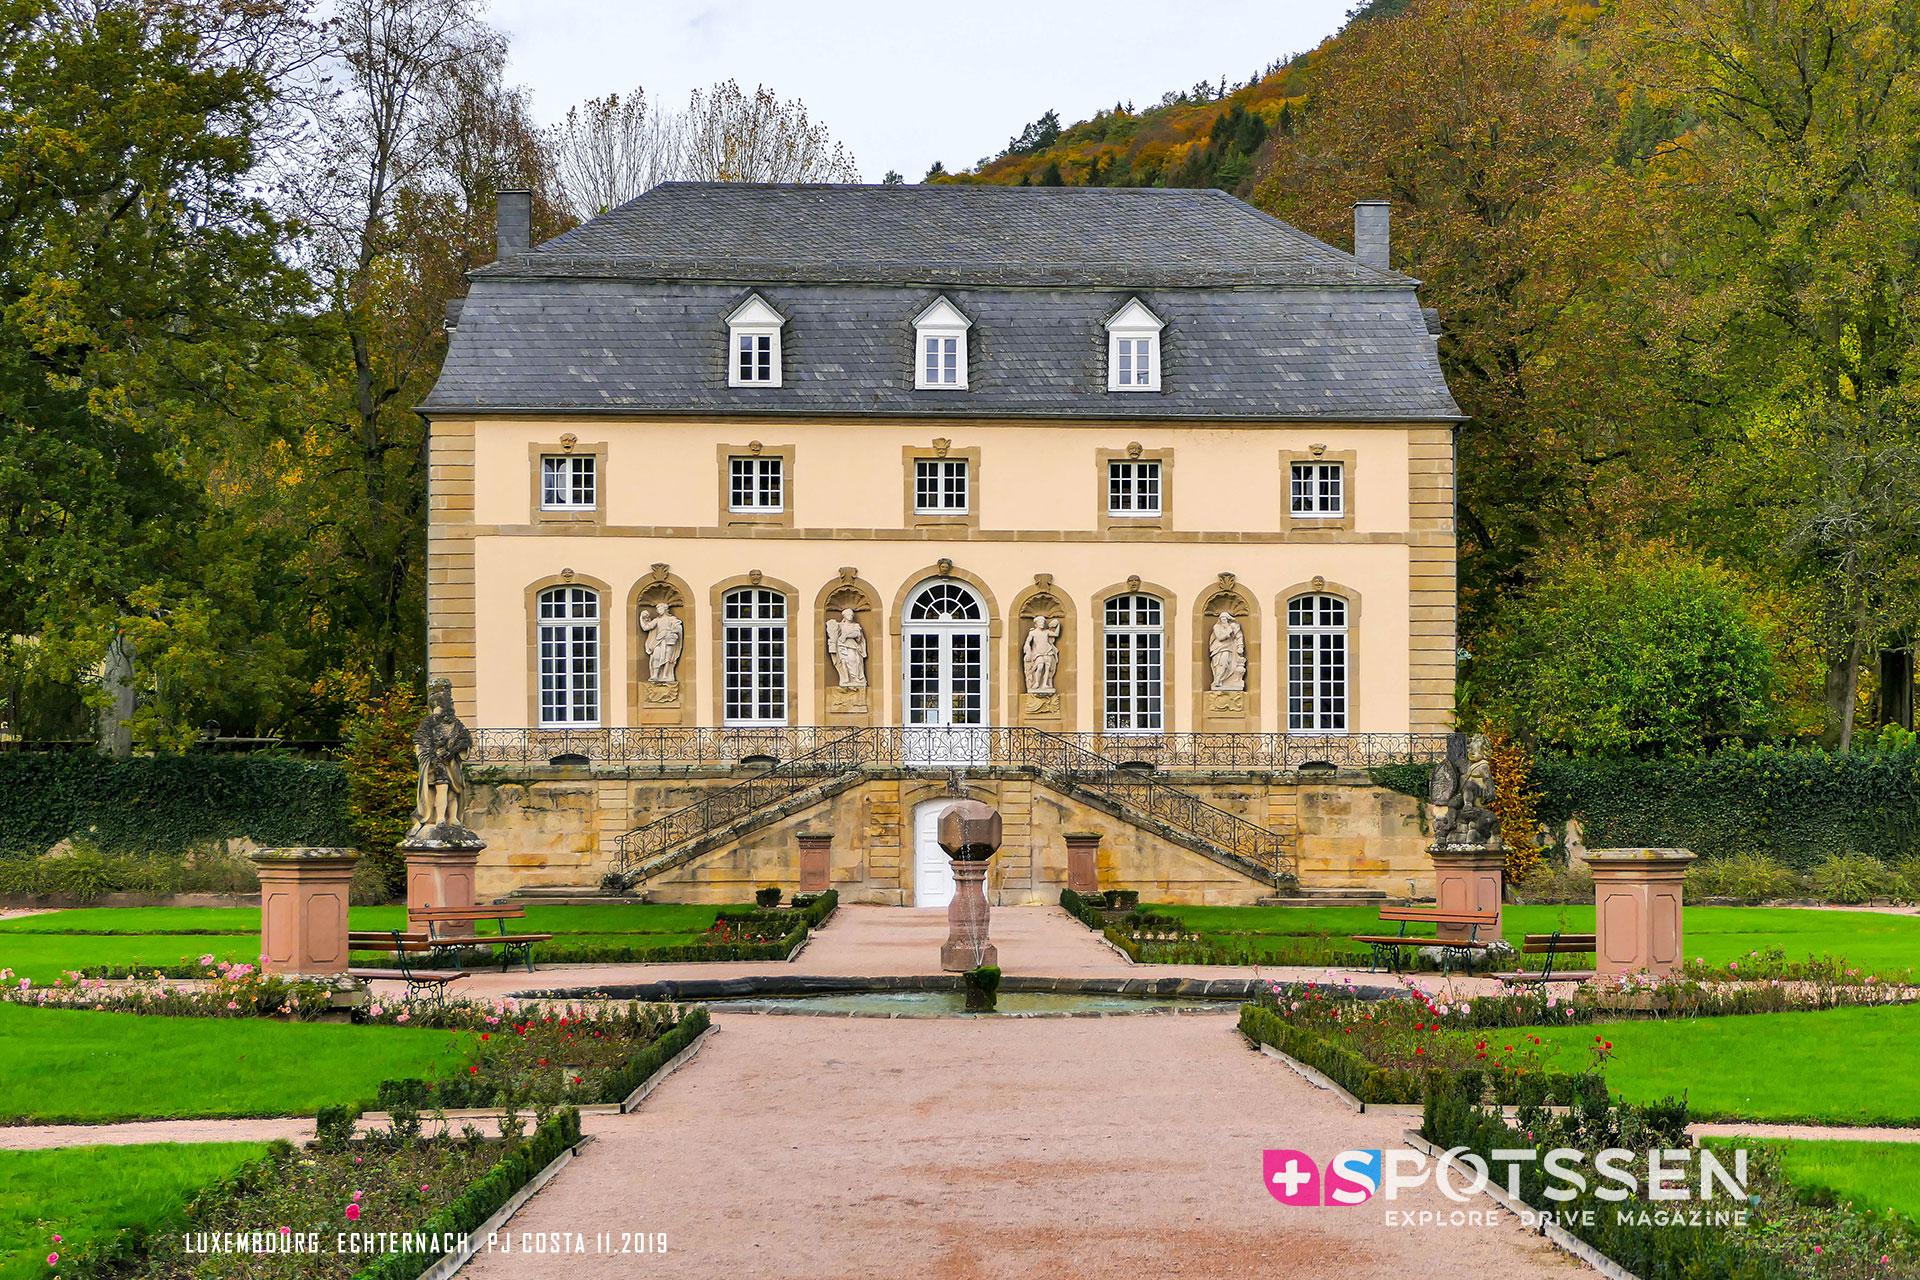 2019, echternach, luxembourg, benelux